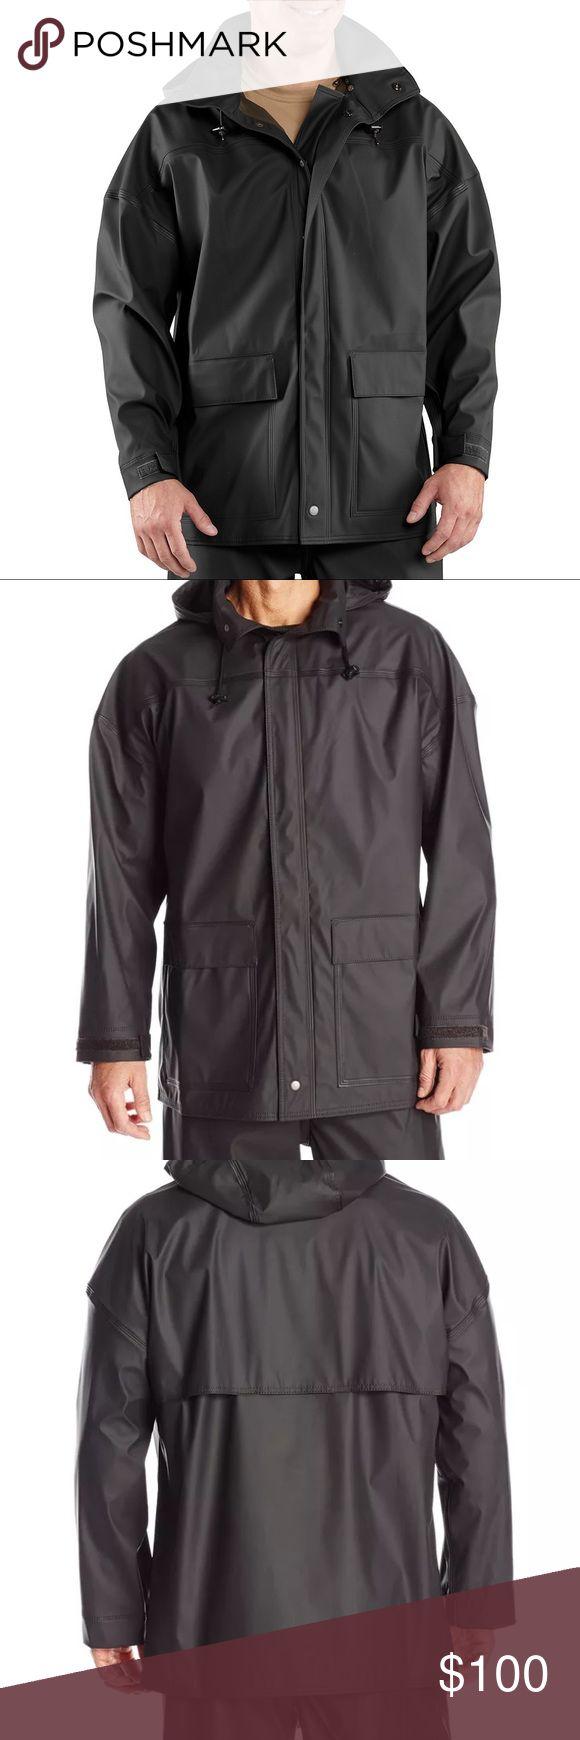 Carhartt Mens Medford Waterproof black rain jacket Brand new with tags large Carhartt Jackets & Coats Raincoats